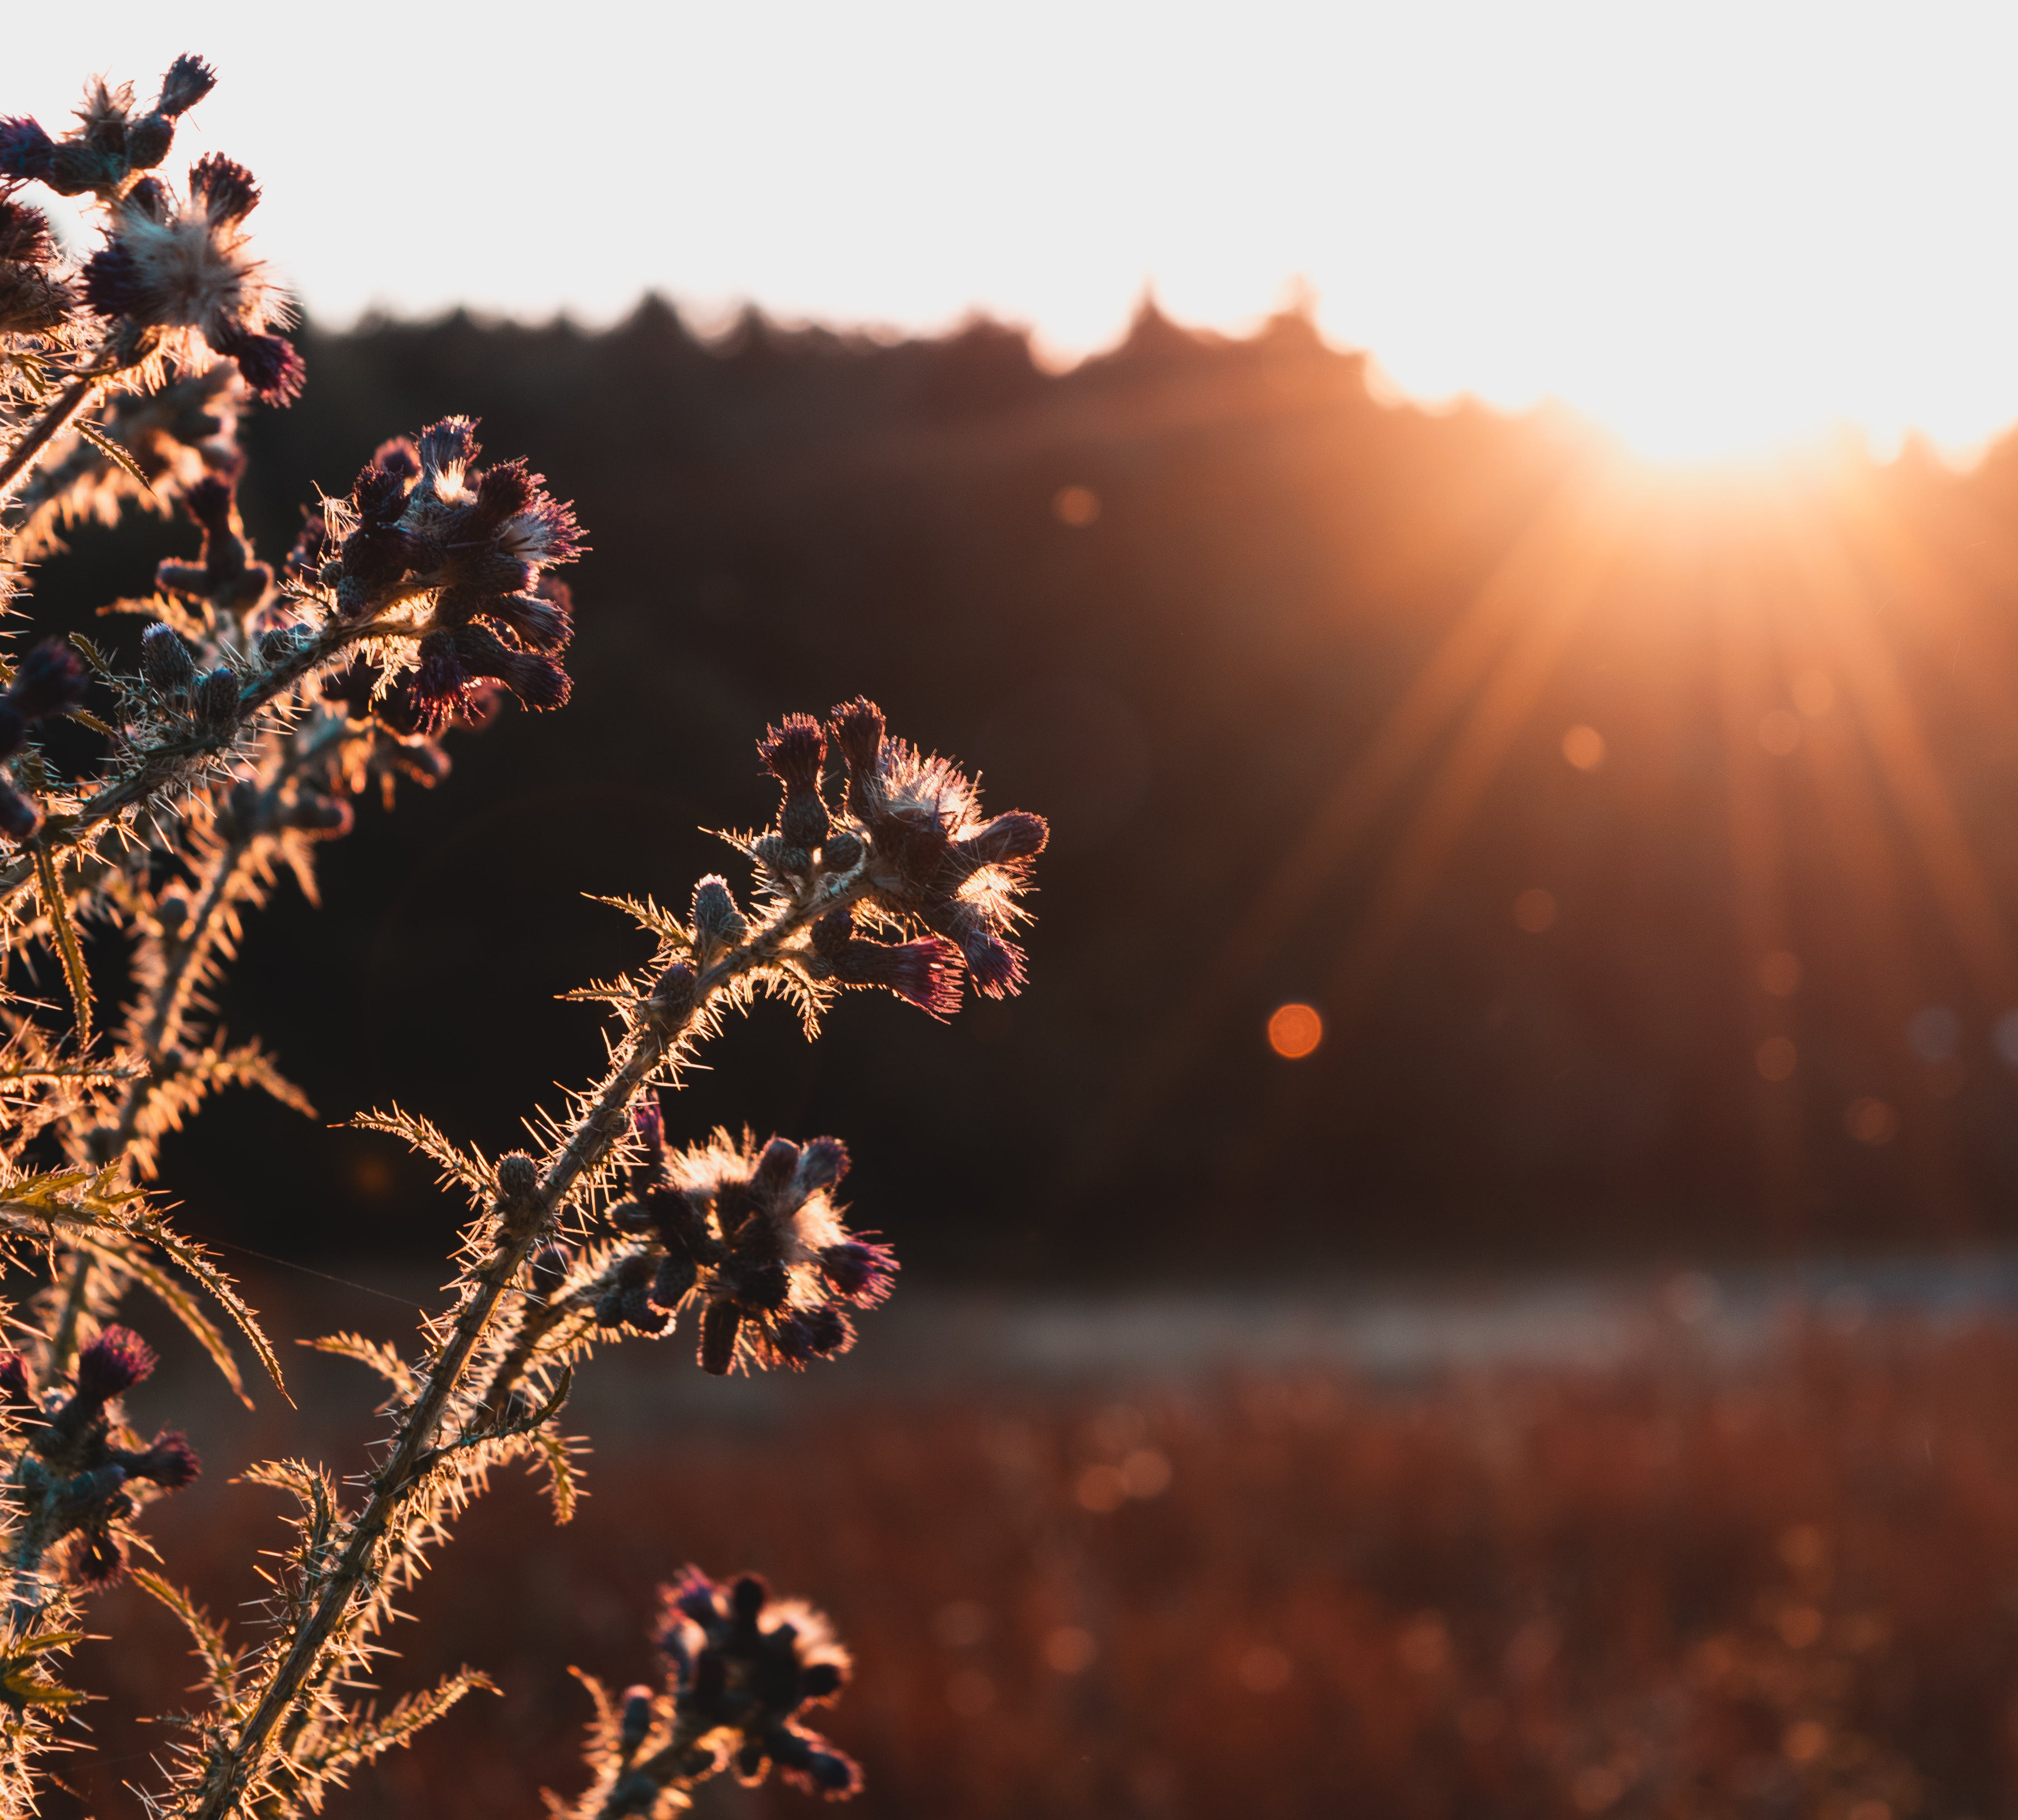 Fotos de stock gratuitas de amanecer, árbol, cardo, concentrarse